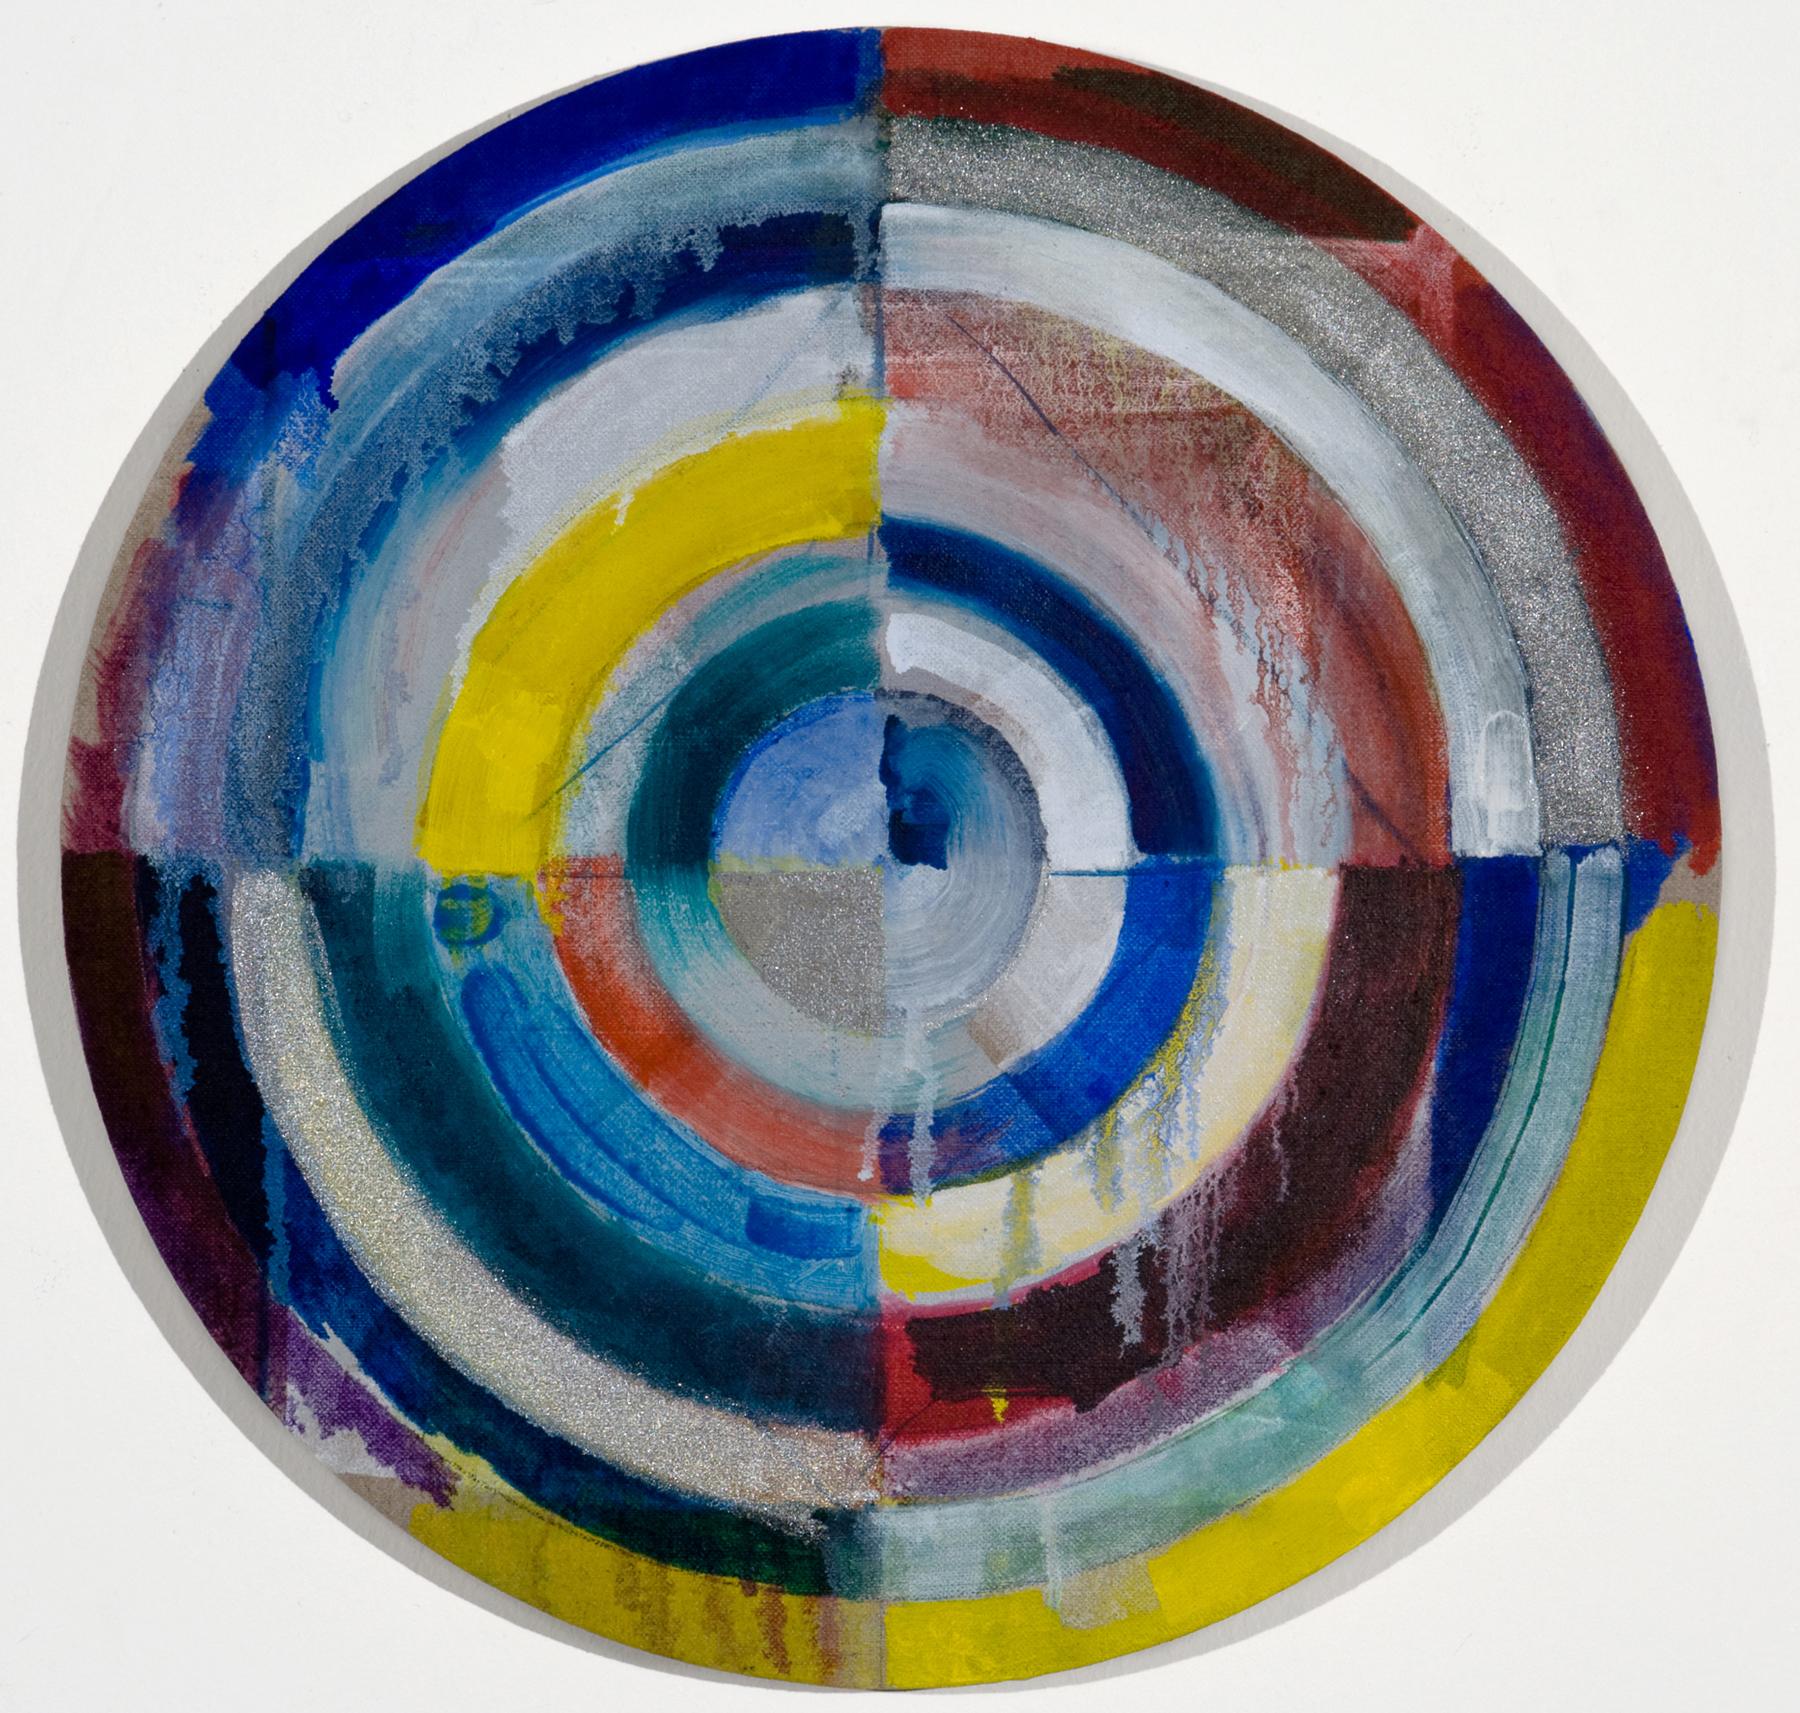 "PAMELA JORDEN  [BACK ROOM] Untitled, oil on linen, 14.875"", 2011"